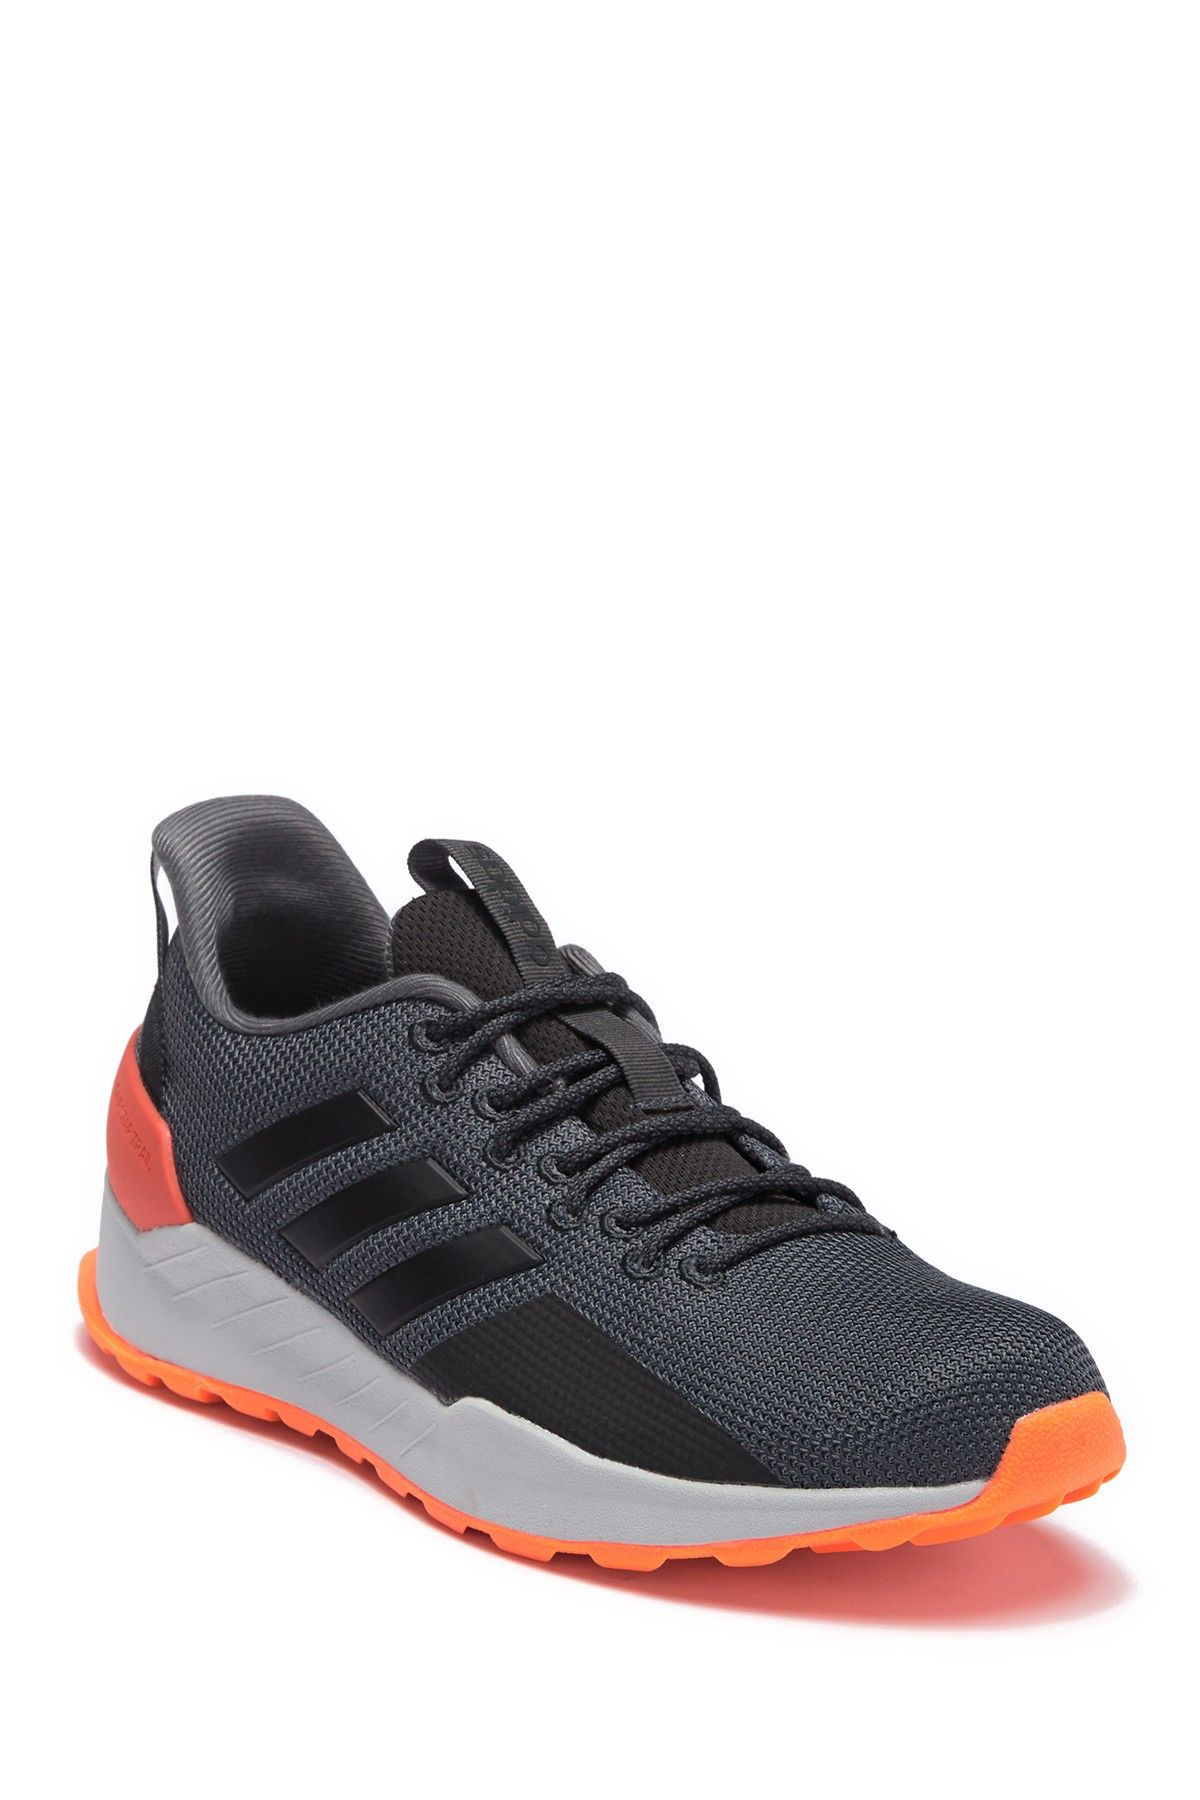 Questar Trail Running Sneaker In Carbon